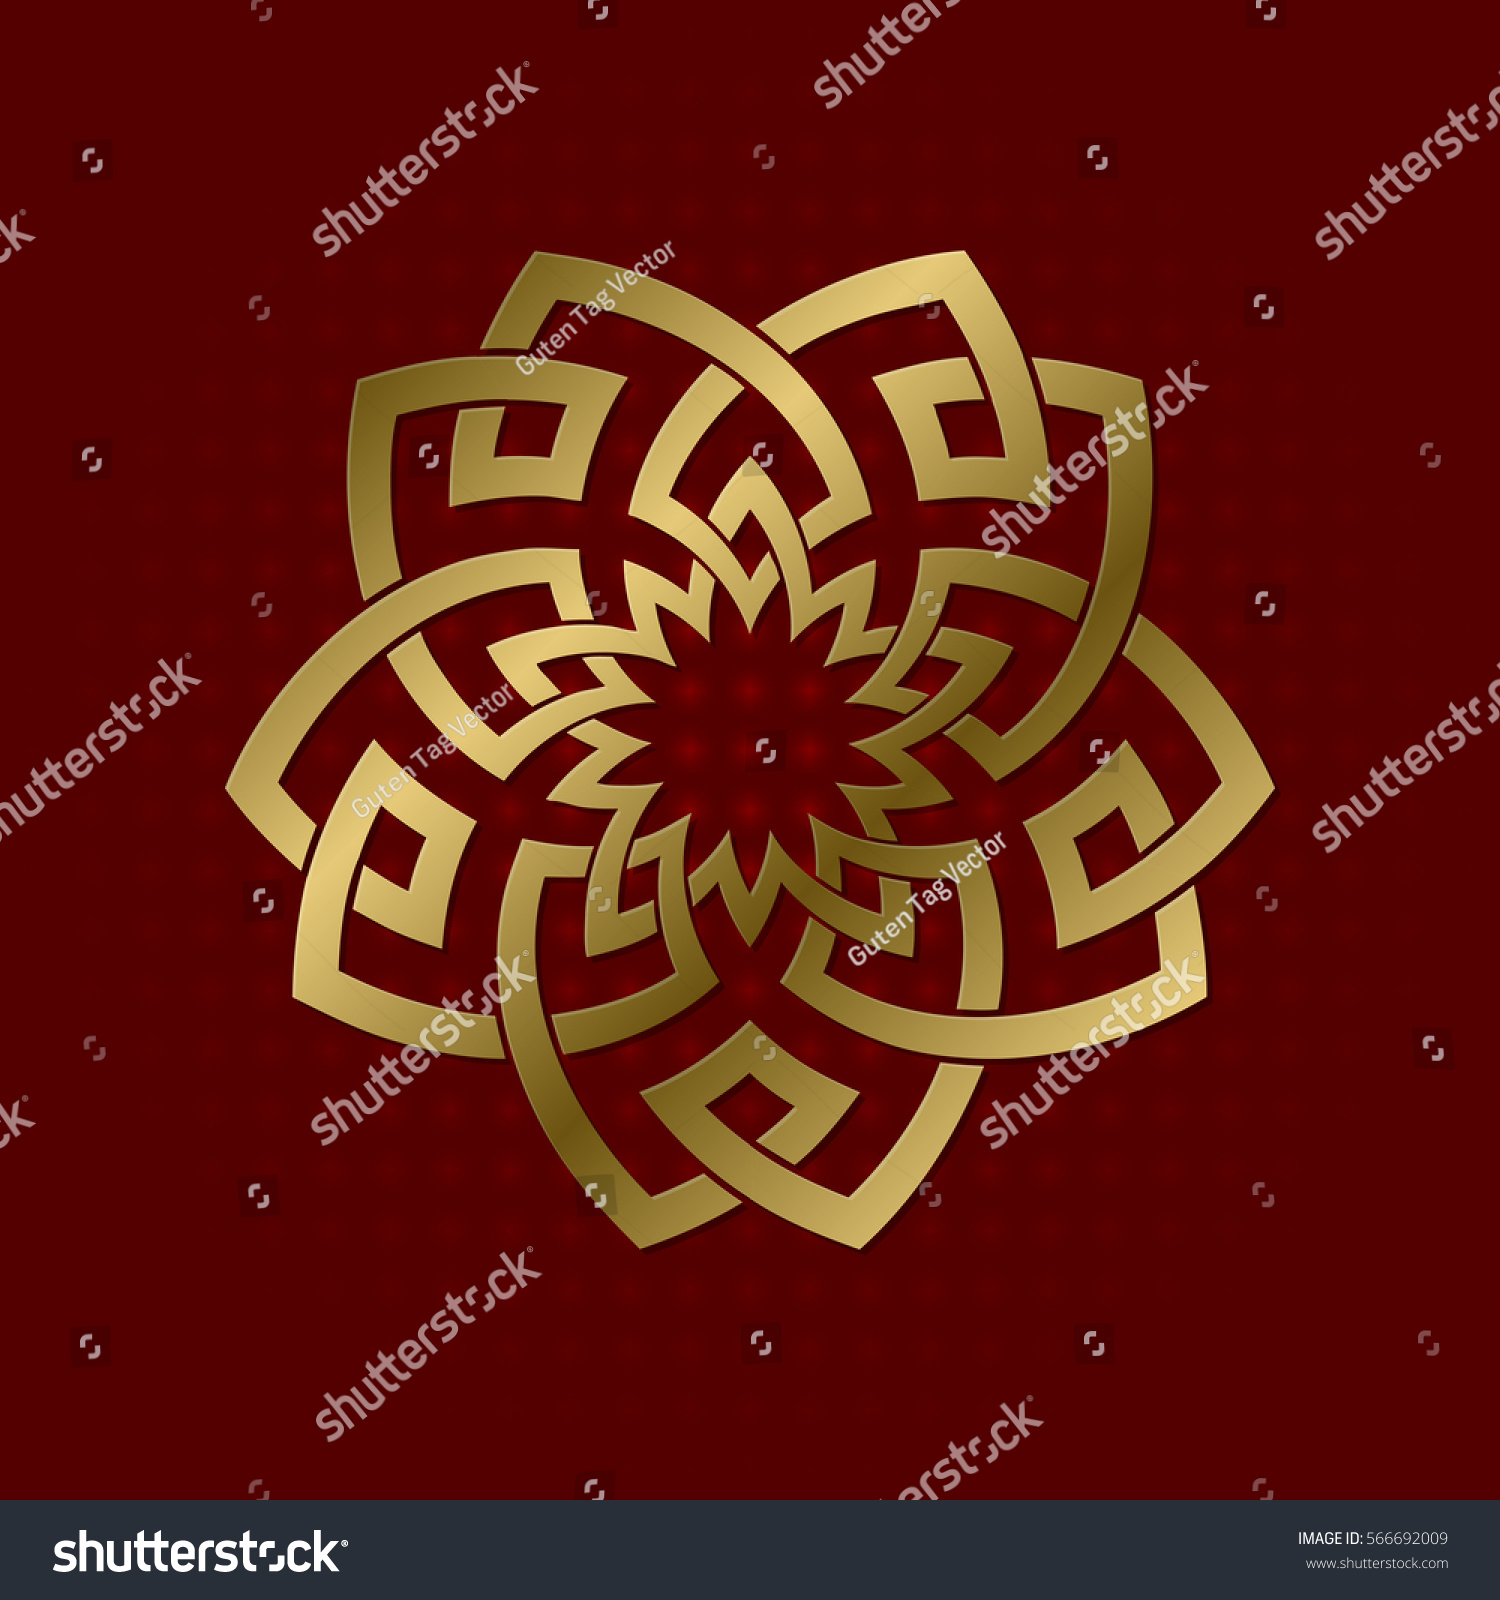 Symbol for five choice image symbol and sign ideas sacred geometric symbol five pointed plexus stock vector 566692009 sacred geometric symbol of five pointed plexus biocorpaavc